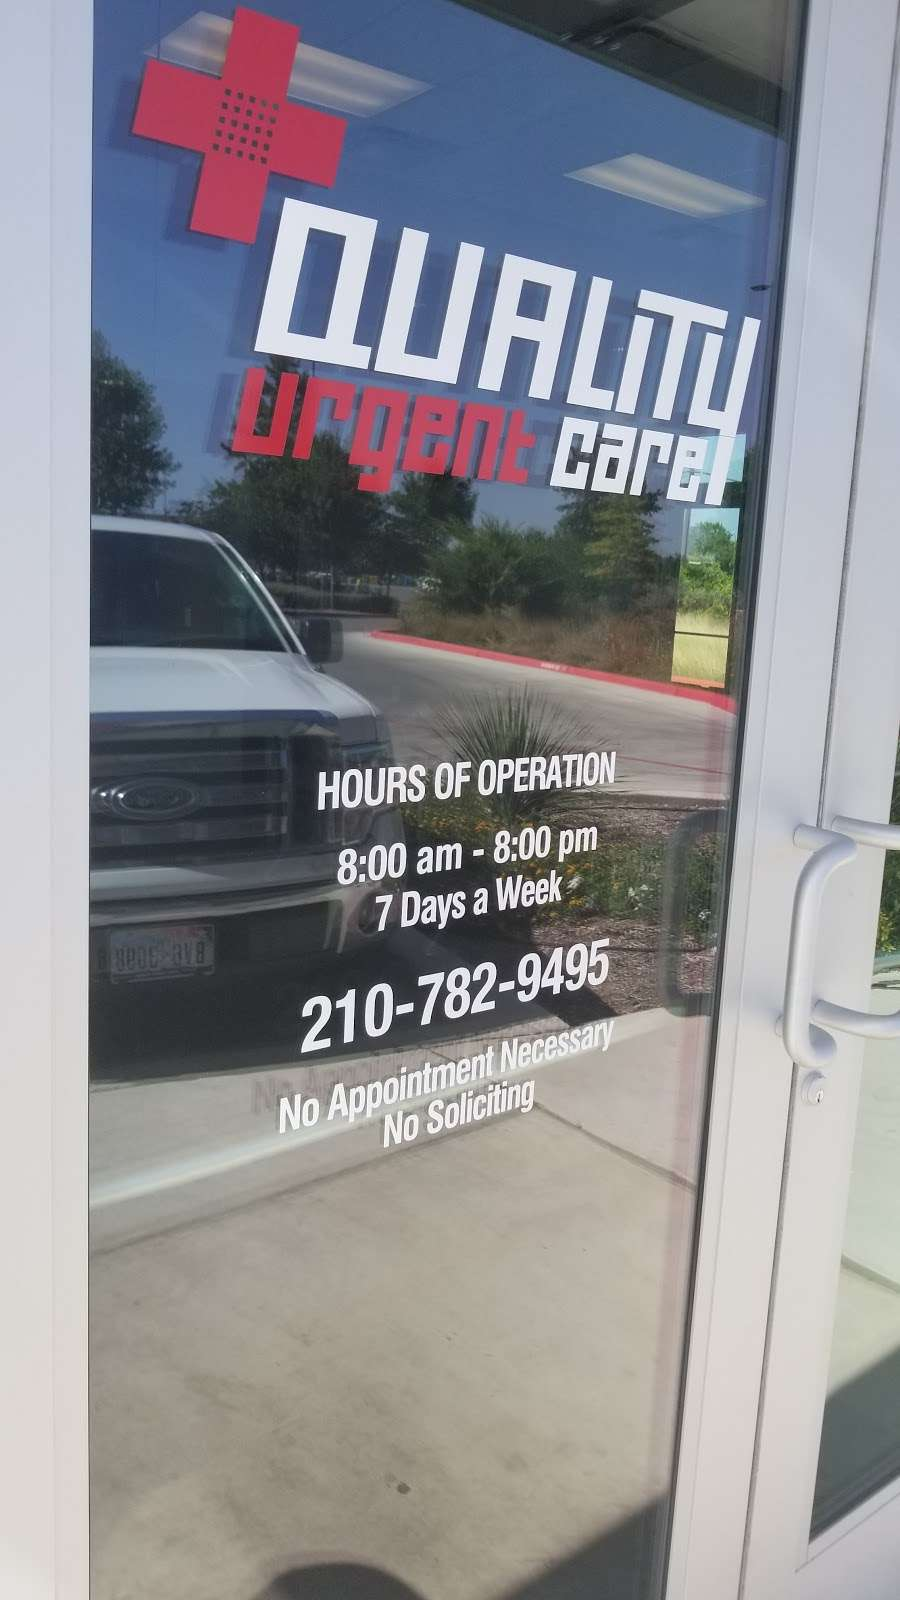 Quality Urgent Care - hospital  | Photo 3 of 6 | Address: 8526, I-35 Ste 101, San Antonio, TX 78211, USA | Phone: (210) 782-9495